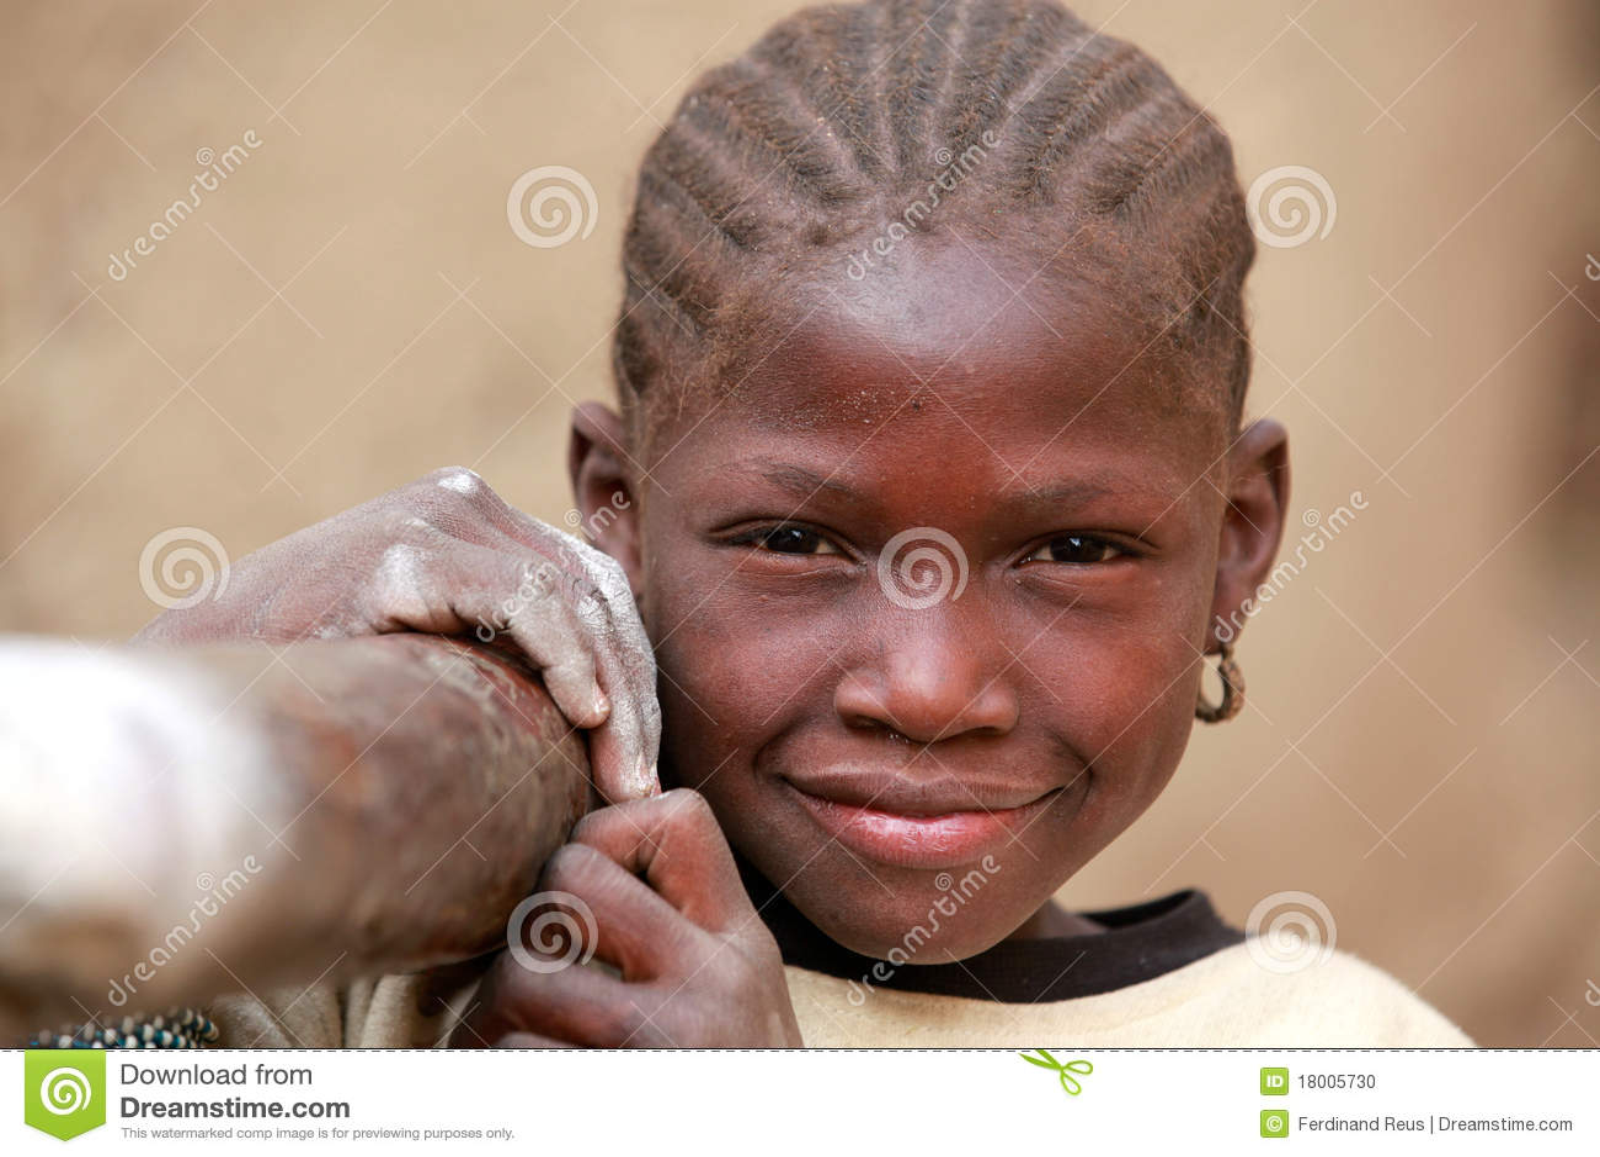 Girl in Africa